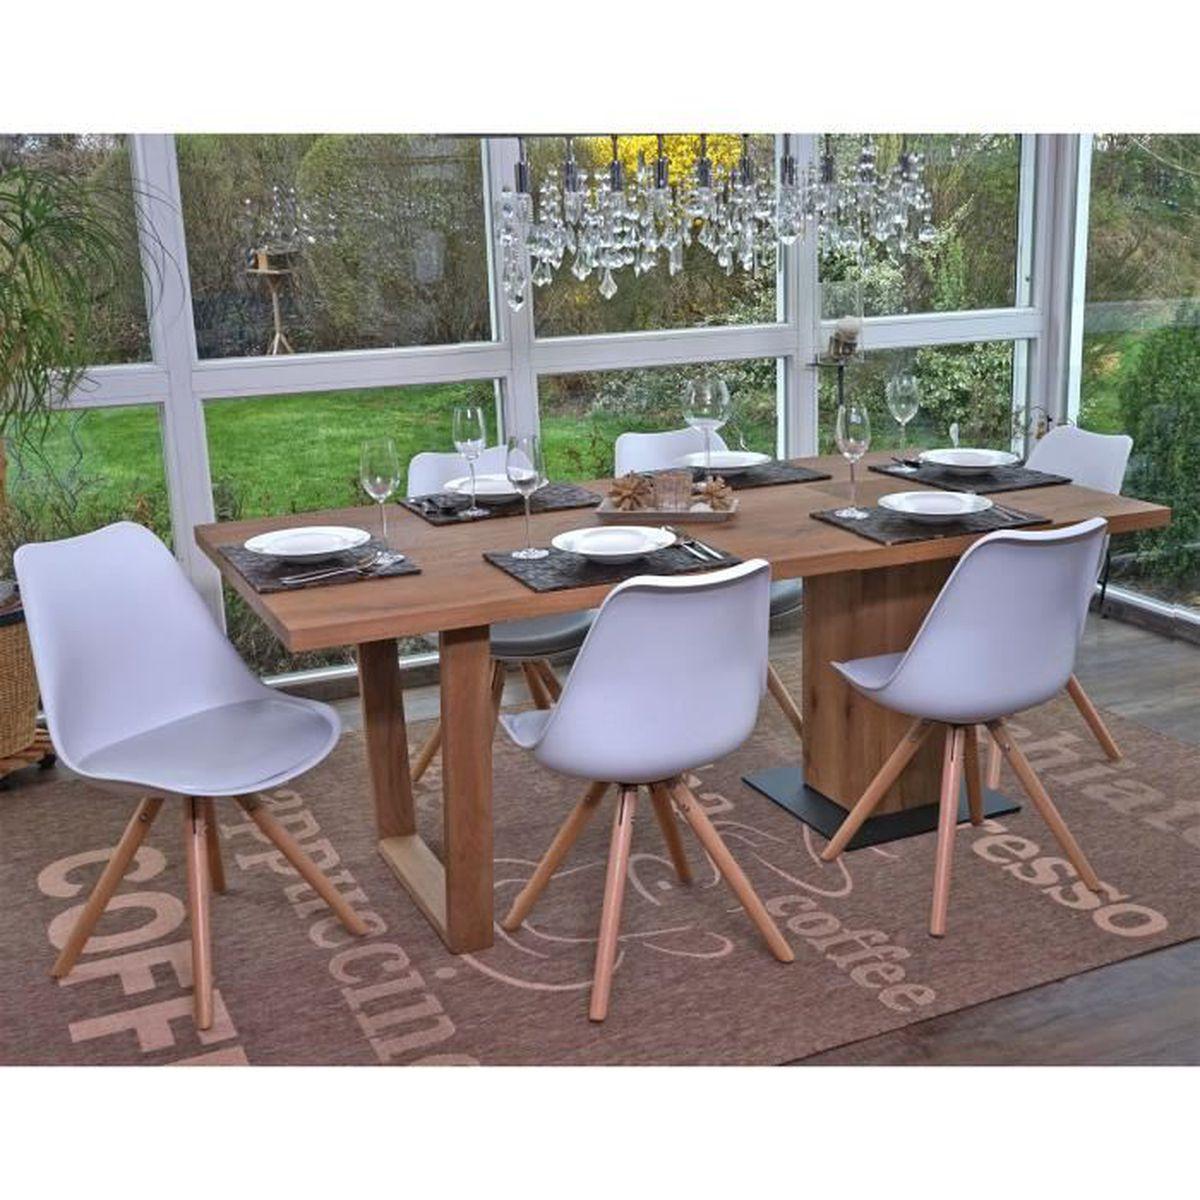 Lot de 6 chaises scandinaves de salle manger blanc 82 cm for Lot de 8 chaise de salle a manger